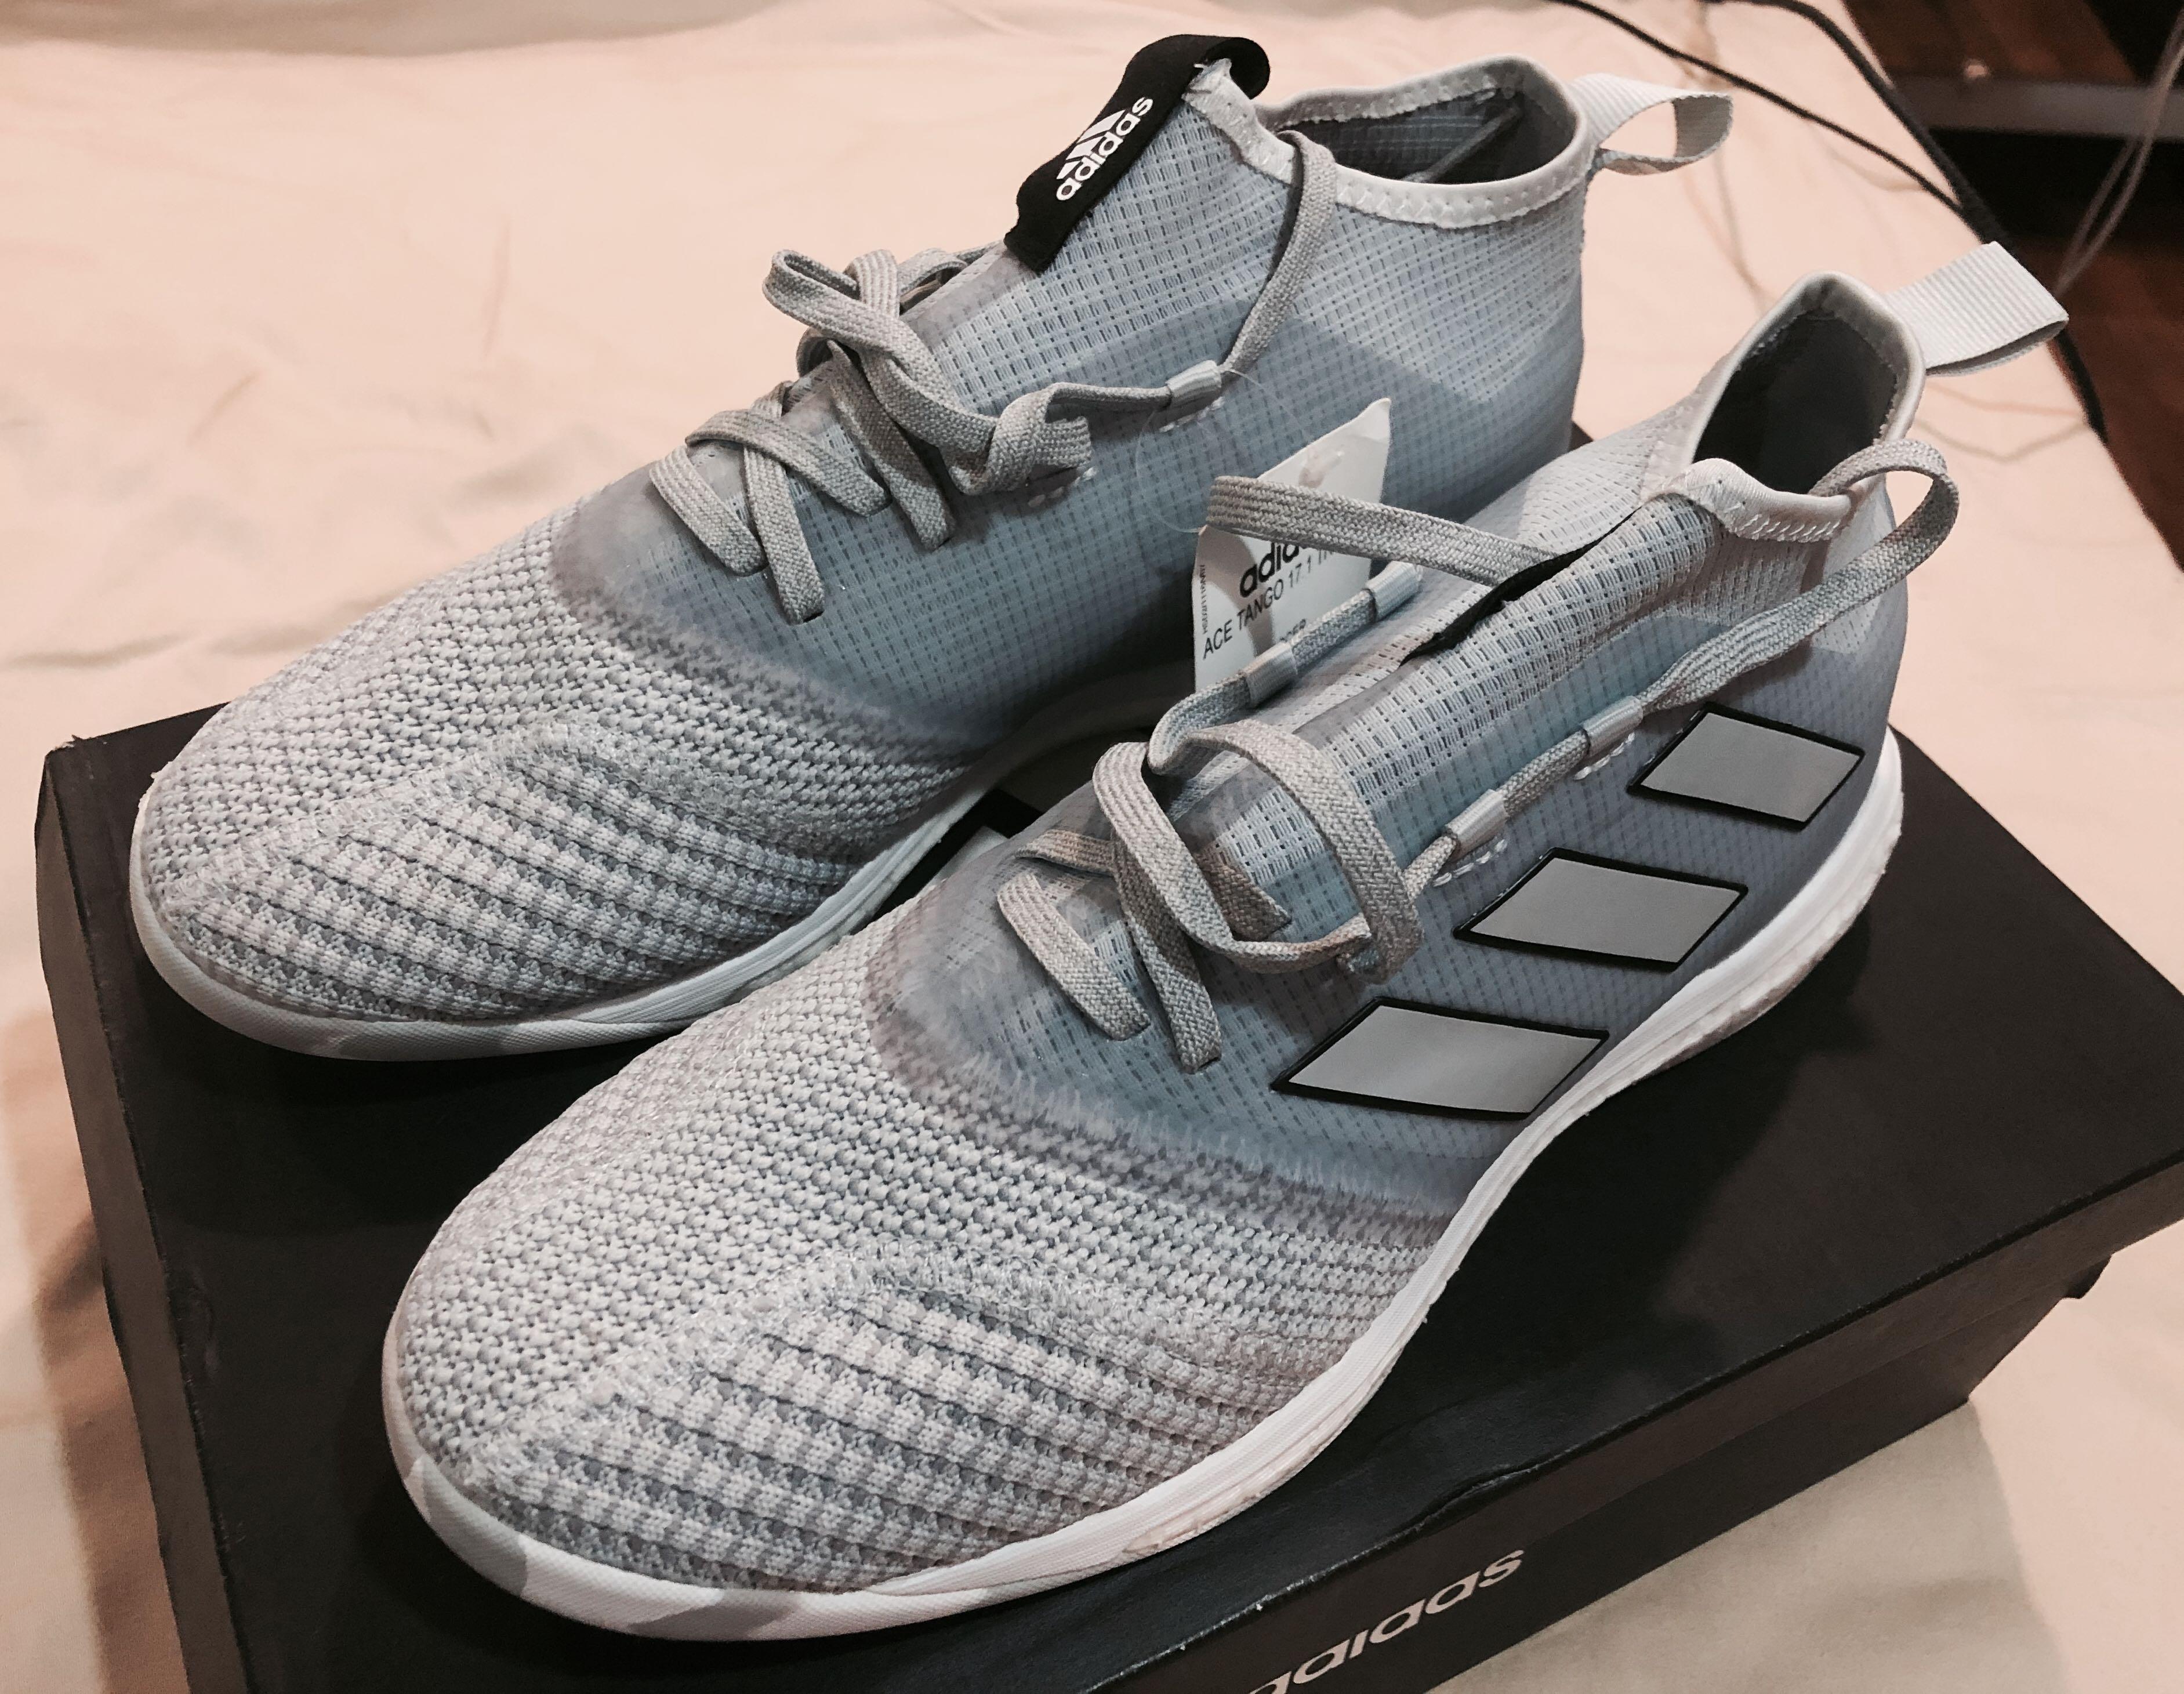 clímax personalidad Marchitar  BNIB Adidas Ace Tango 17.1 TR for sale!, Men's Fashion, Footwear, Sneakers  on Carousell